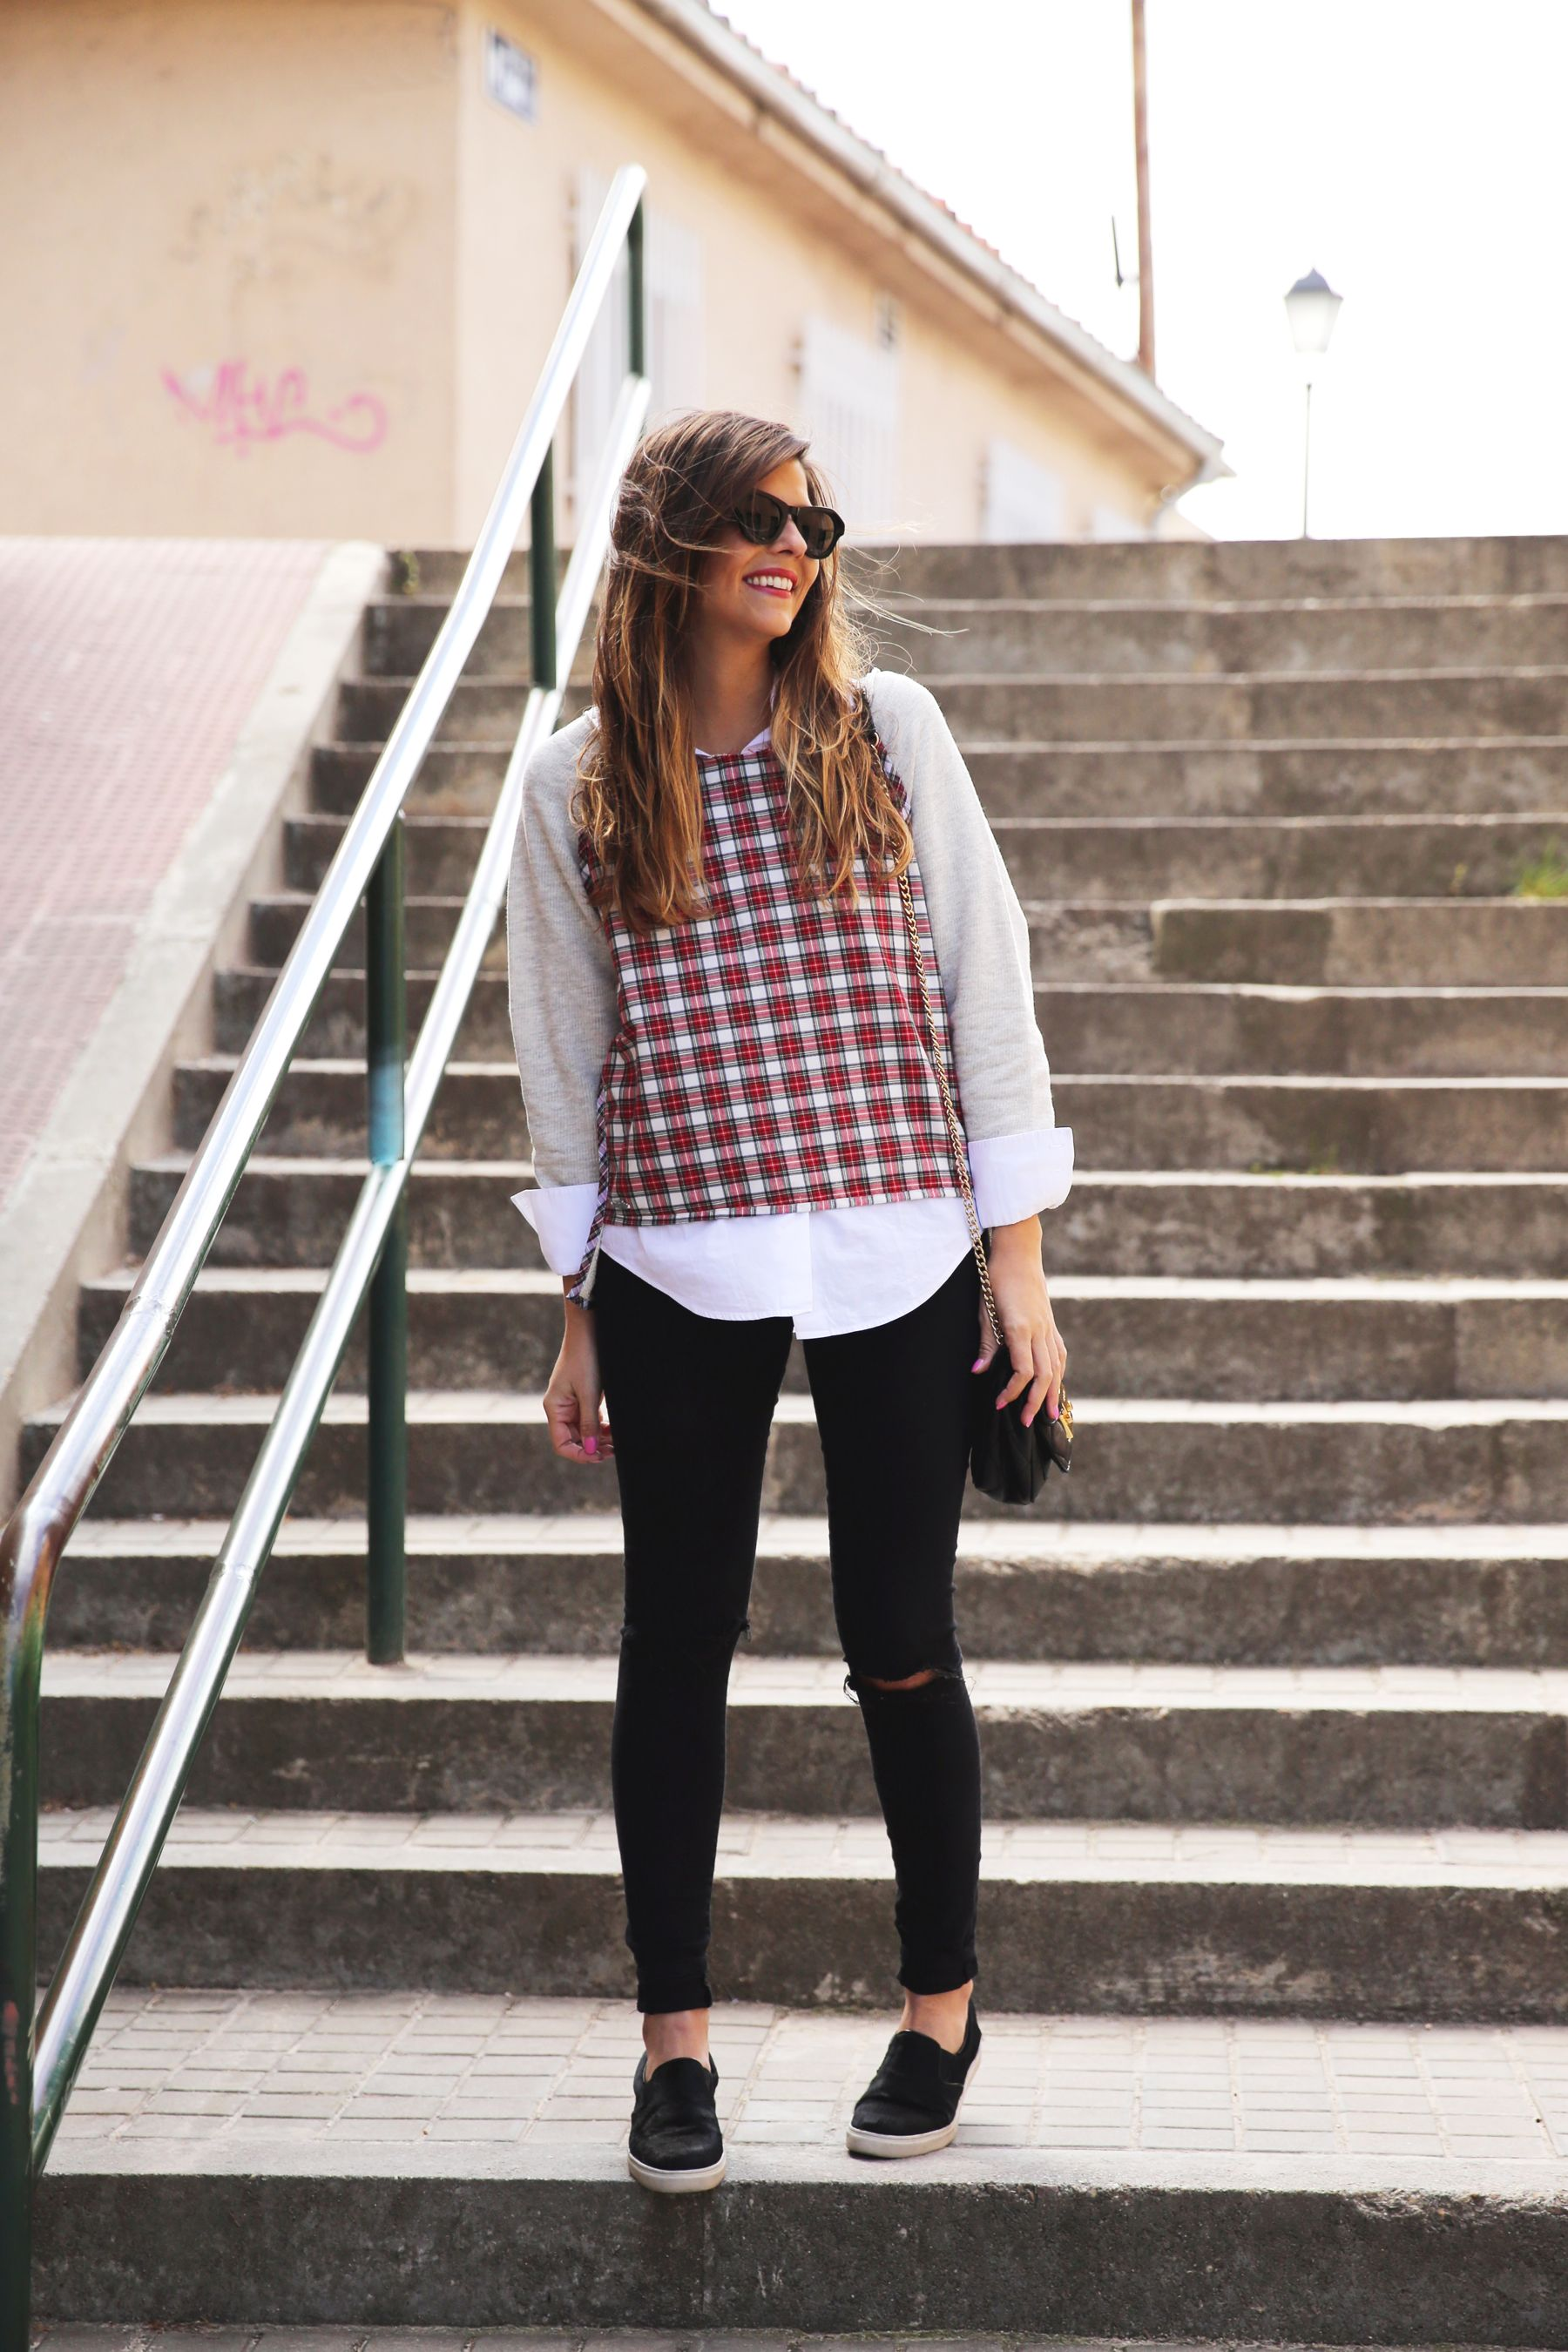 trendy_taste-look-outfit-street_style-ootd-blog-blogger-fashion-spain-moda-españa-steve-madden-plaid-shirt-camisa-cuadros-skinny-jeans-pitillos-negros-4